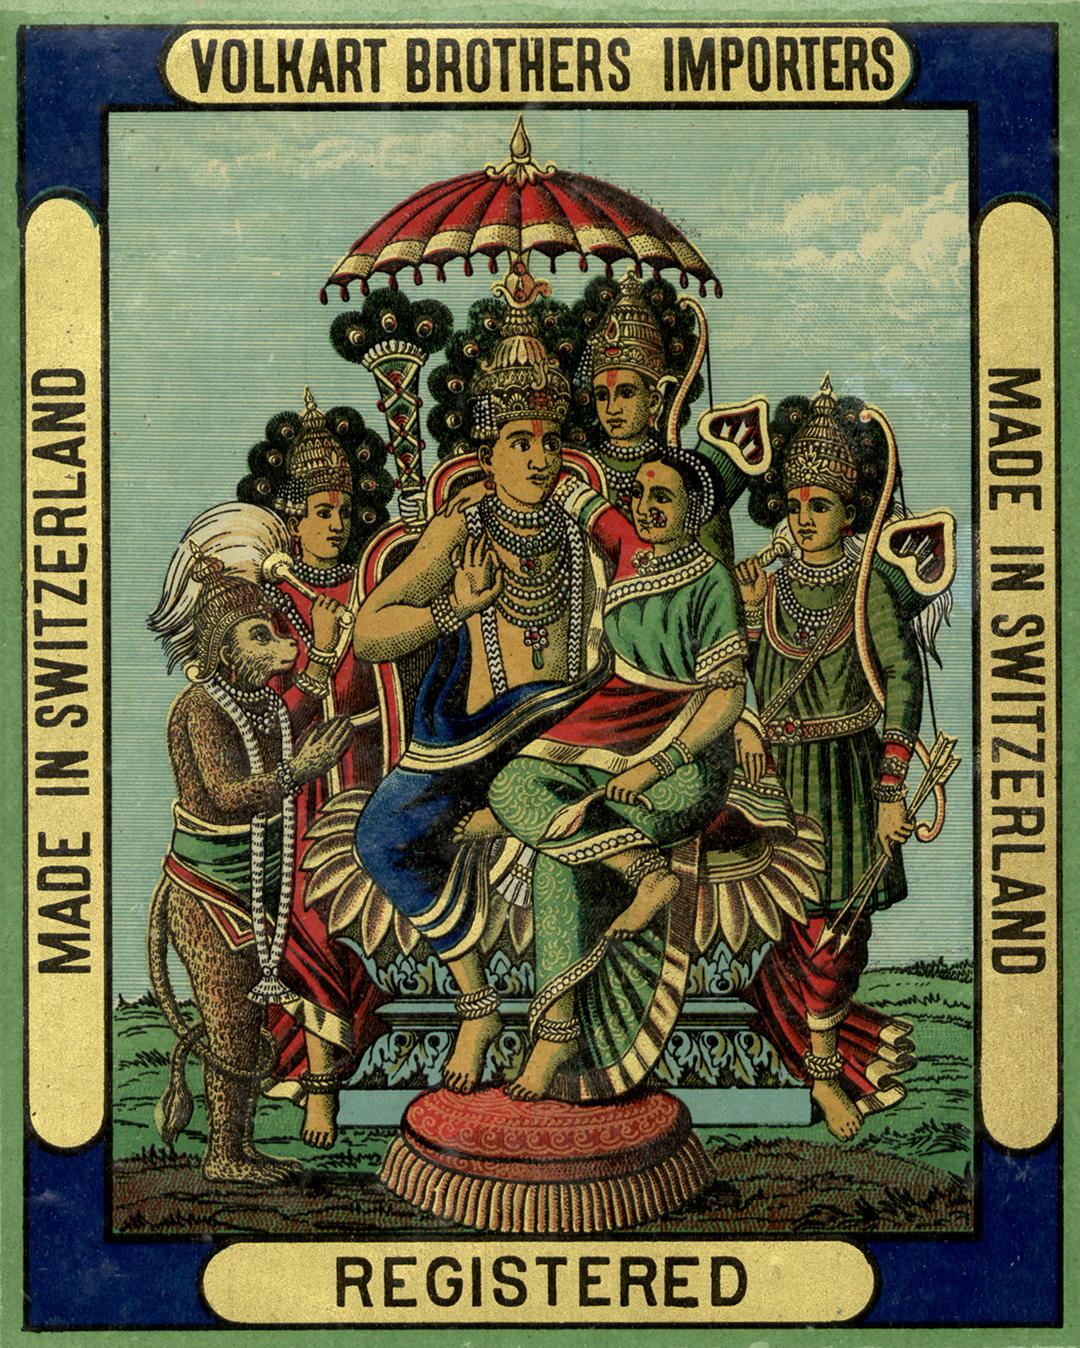 Volkart Etikette, ca. 1920.